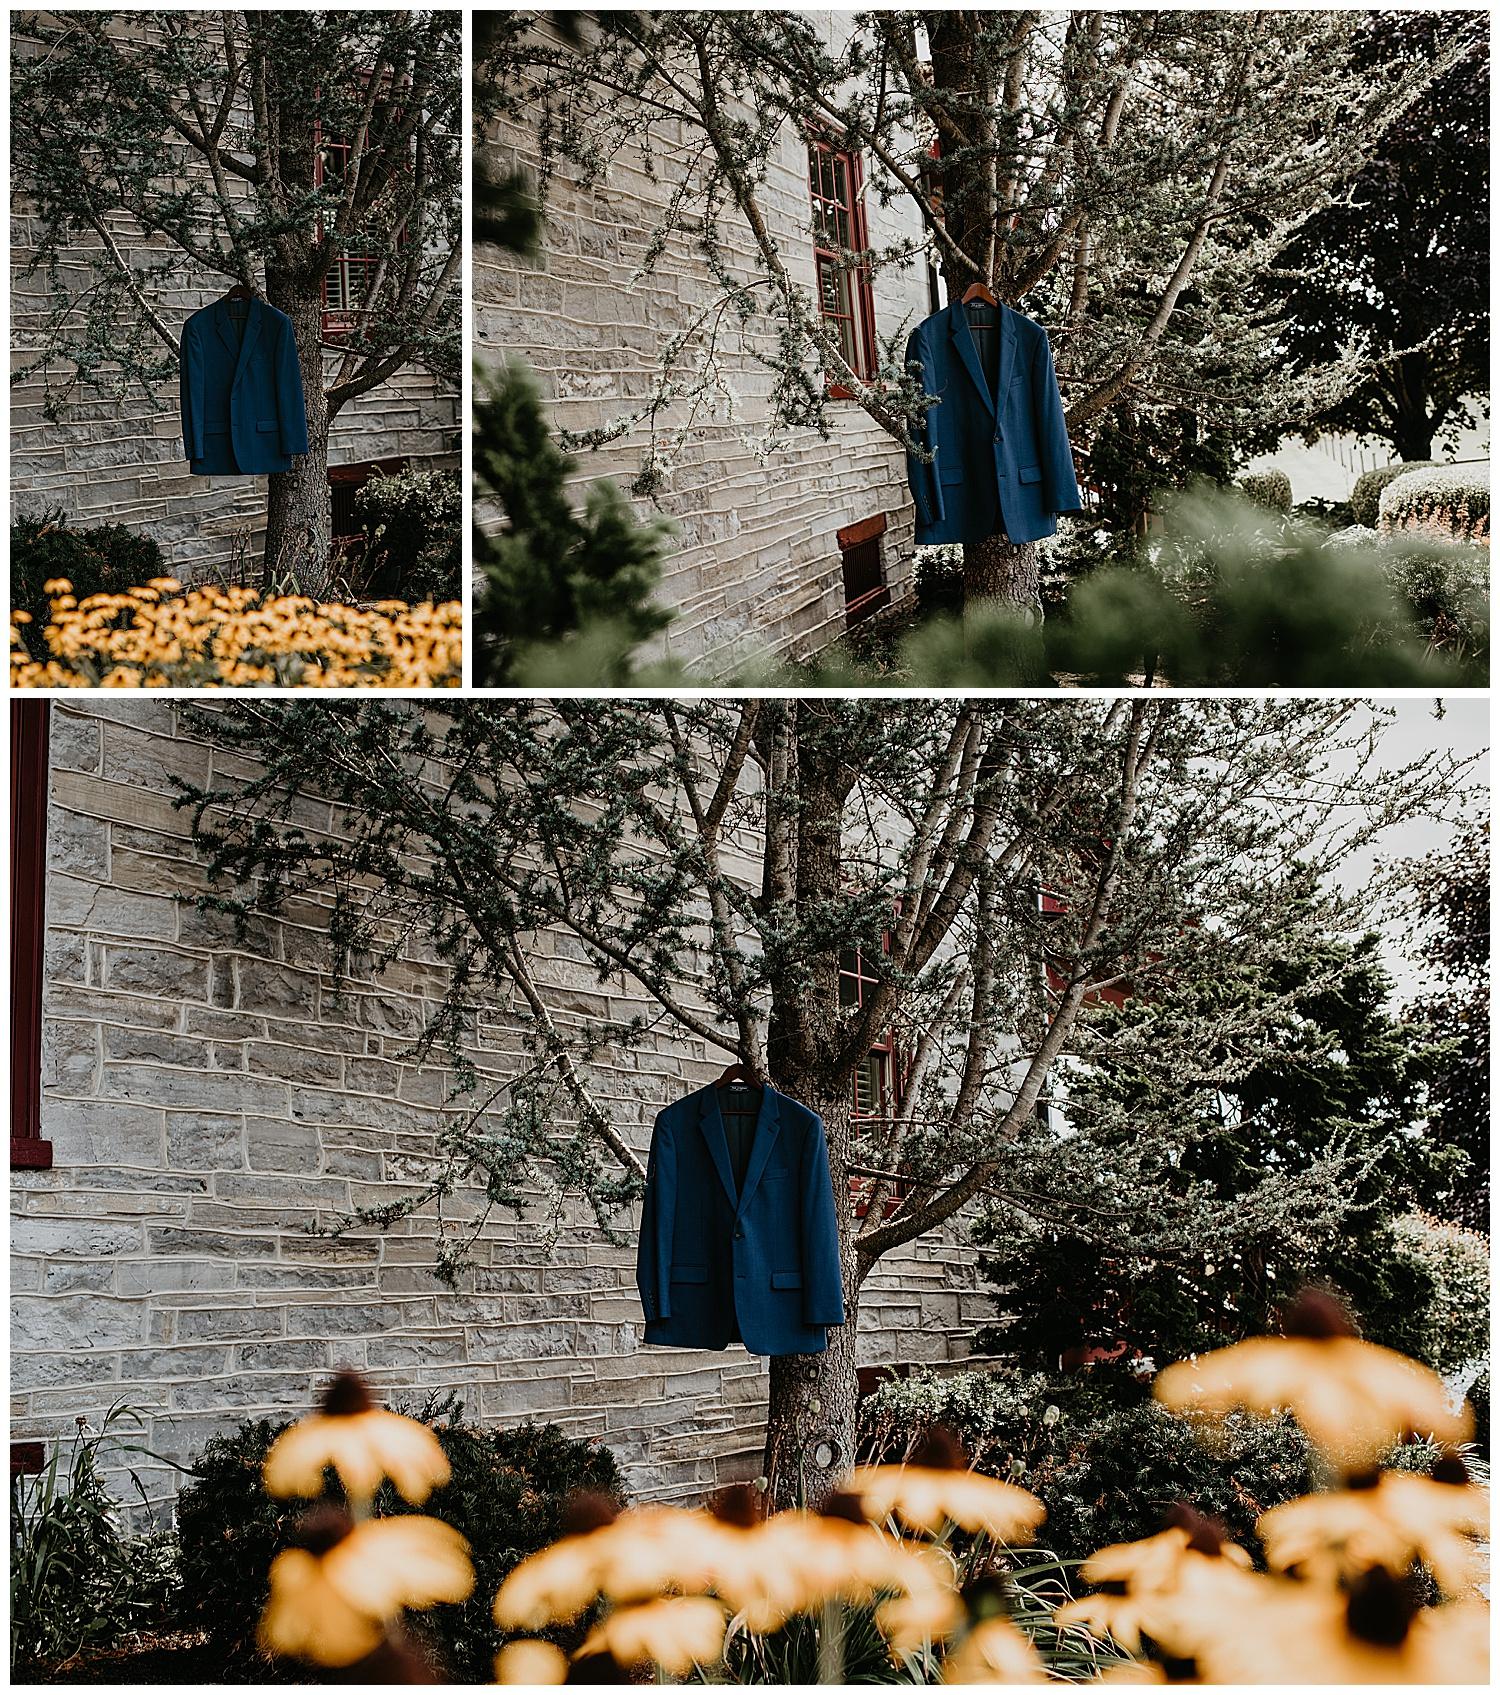 NEPA-Bloomgsburg-Wedding-Photographer-at-The-Barn-at-Greystone-Farms-Watsontown-PA_0002.jpg